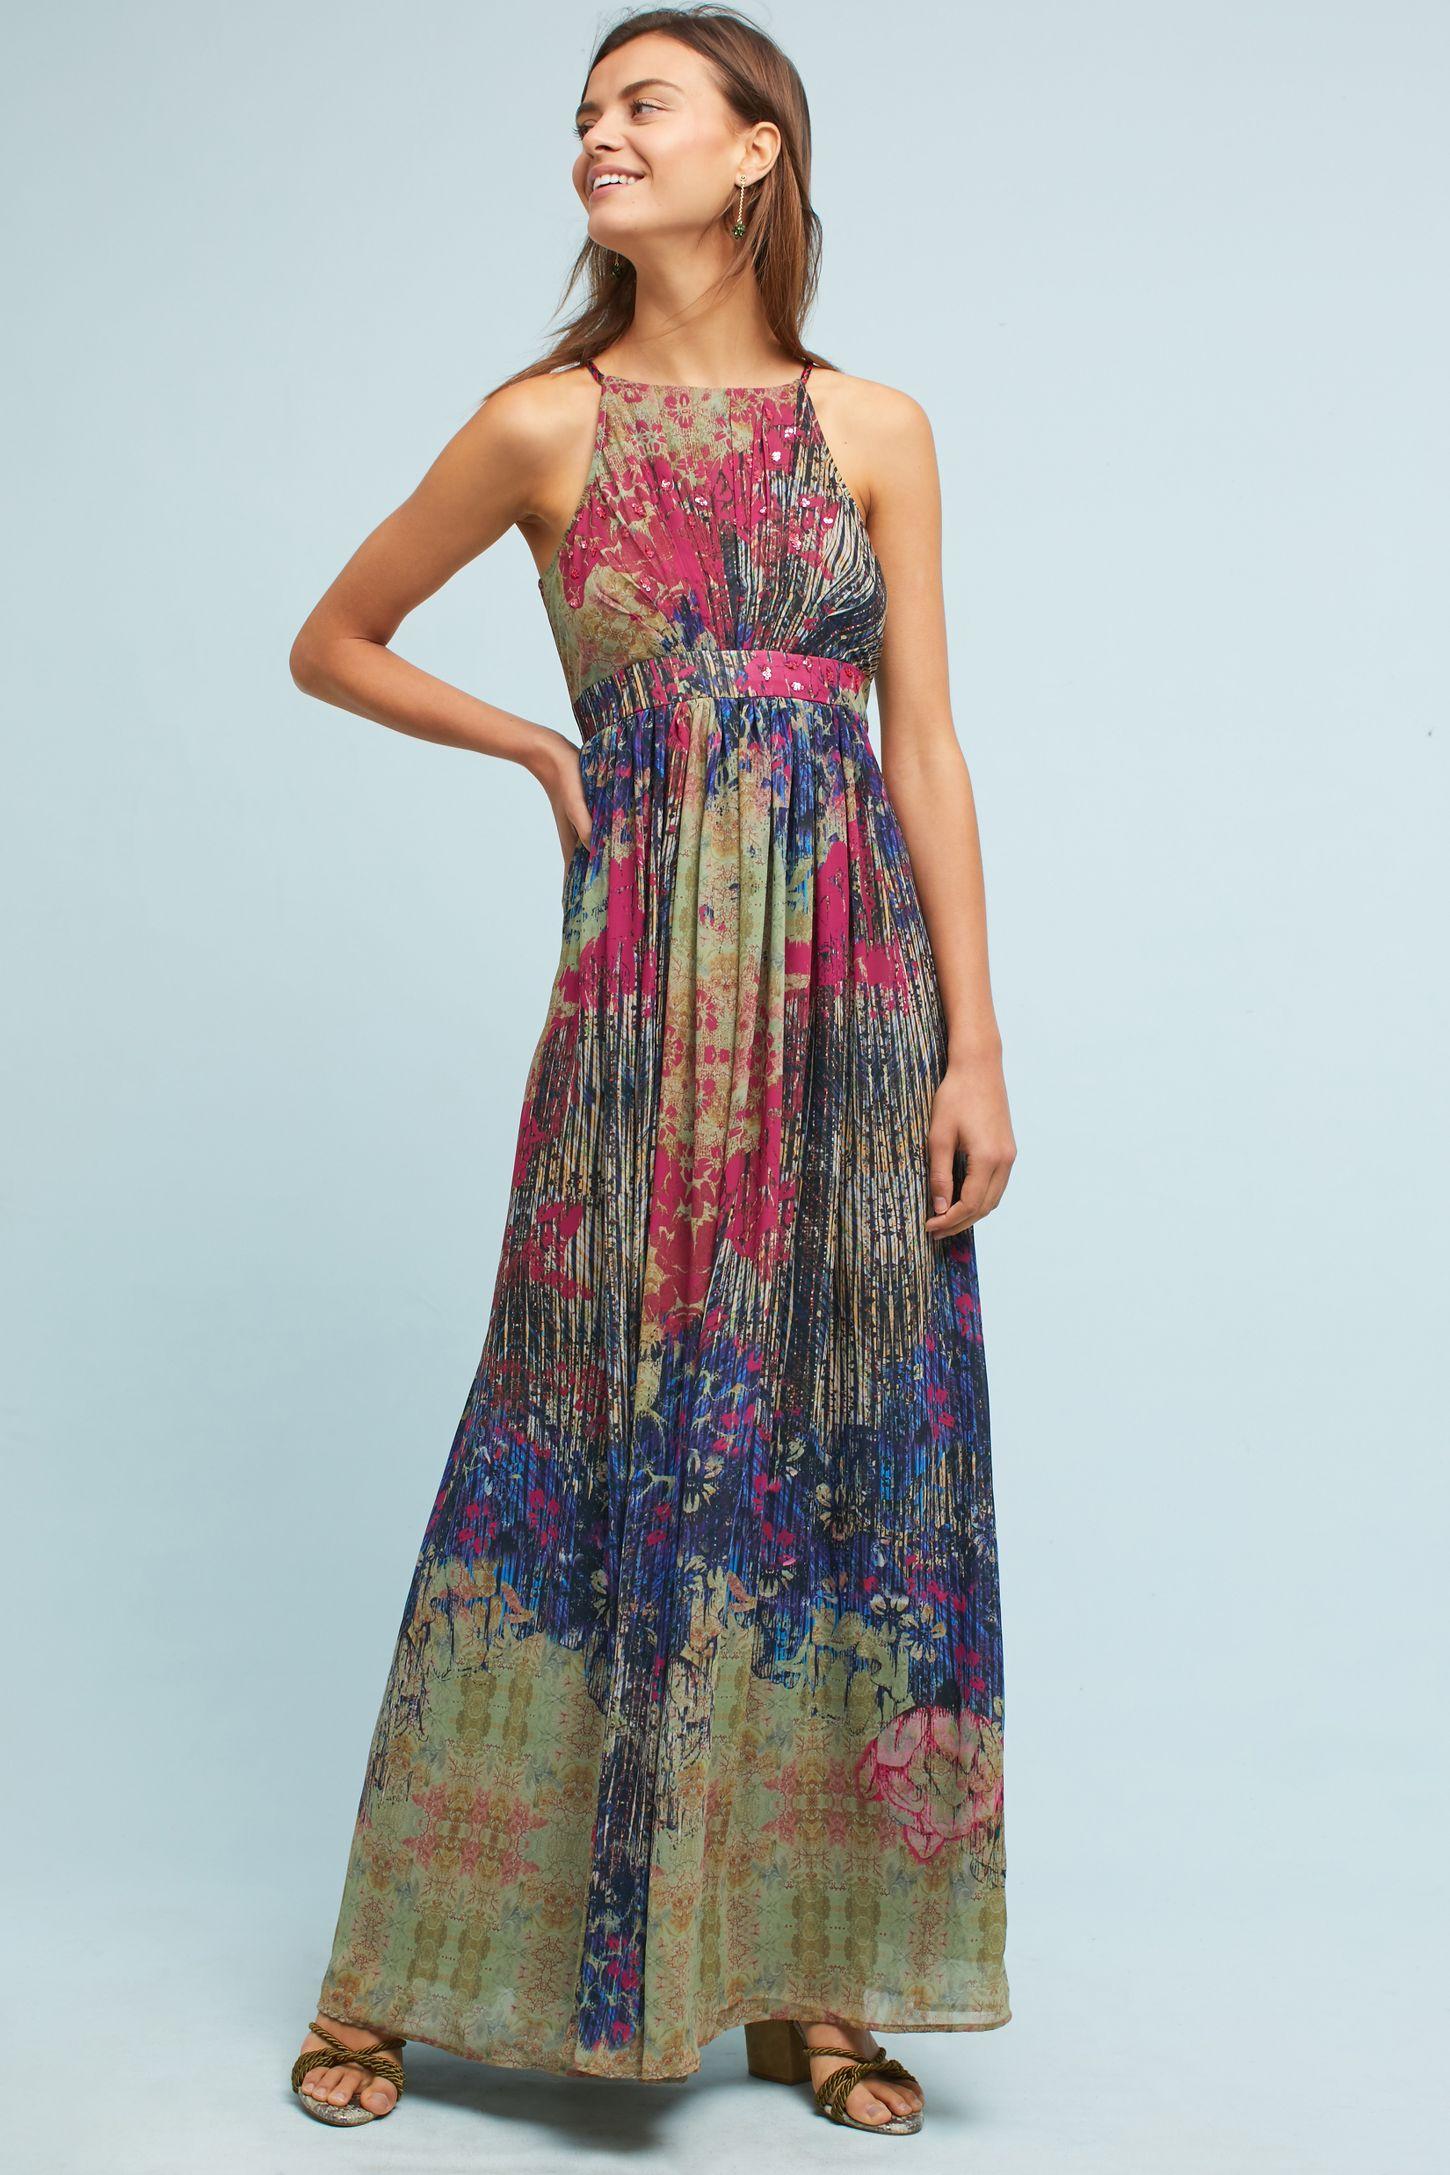 Petite Dresses for Fall | Anthropologie